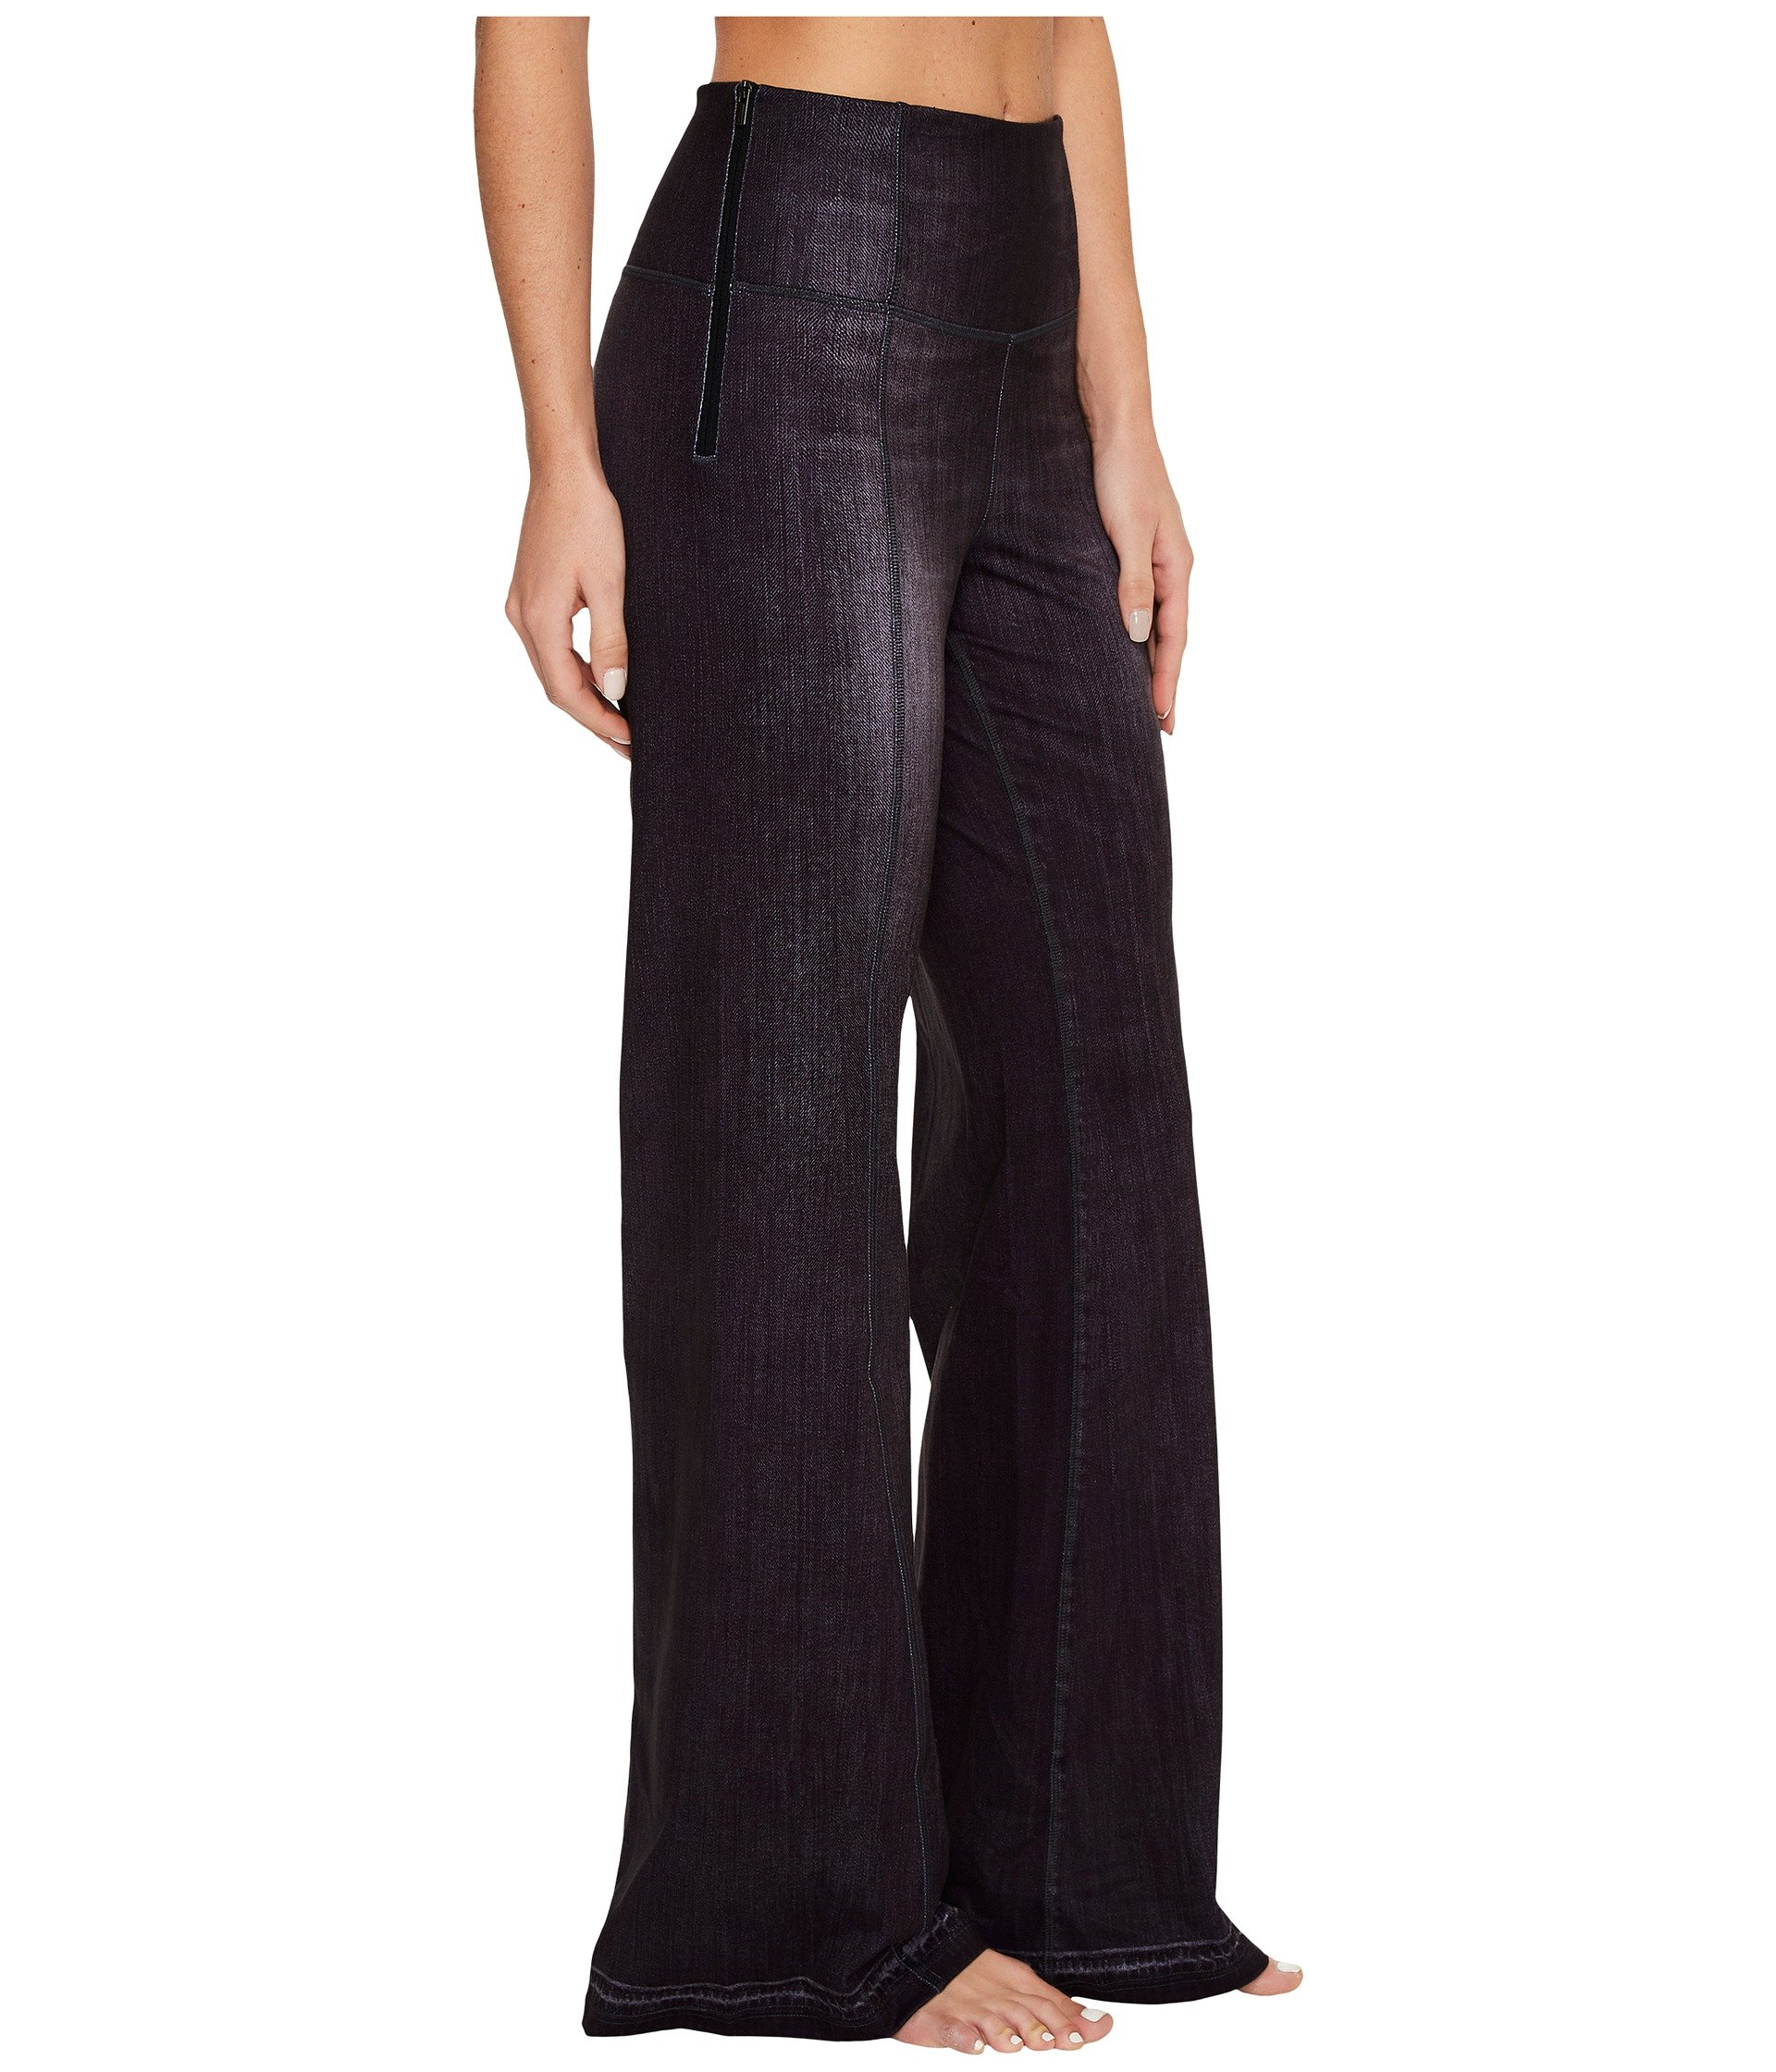 Lucy Women's Indigo Flare Pants Black Indigo Pants by Lucy (Image #5)